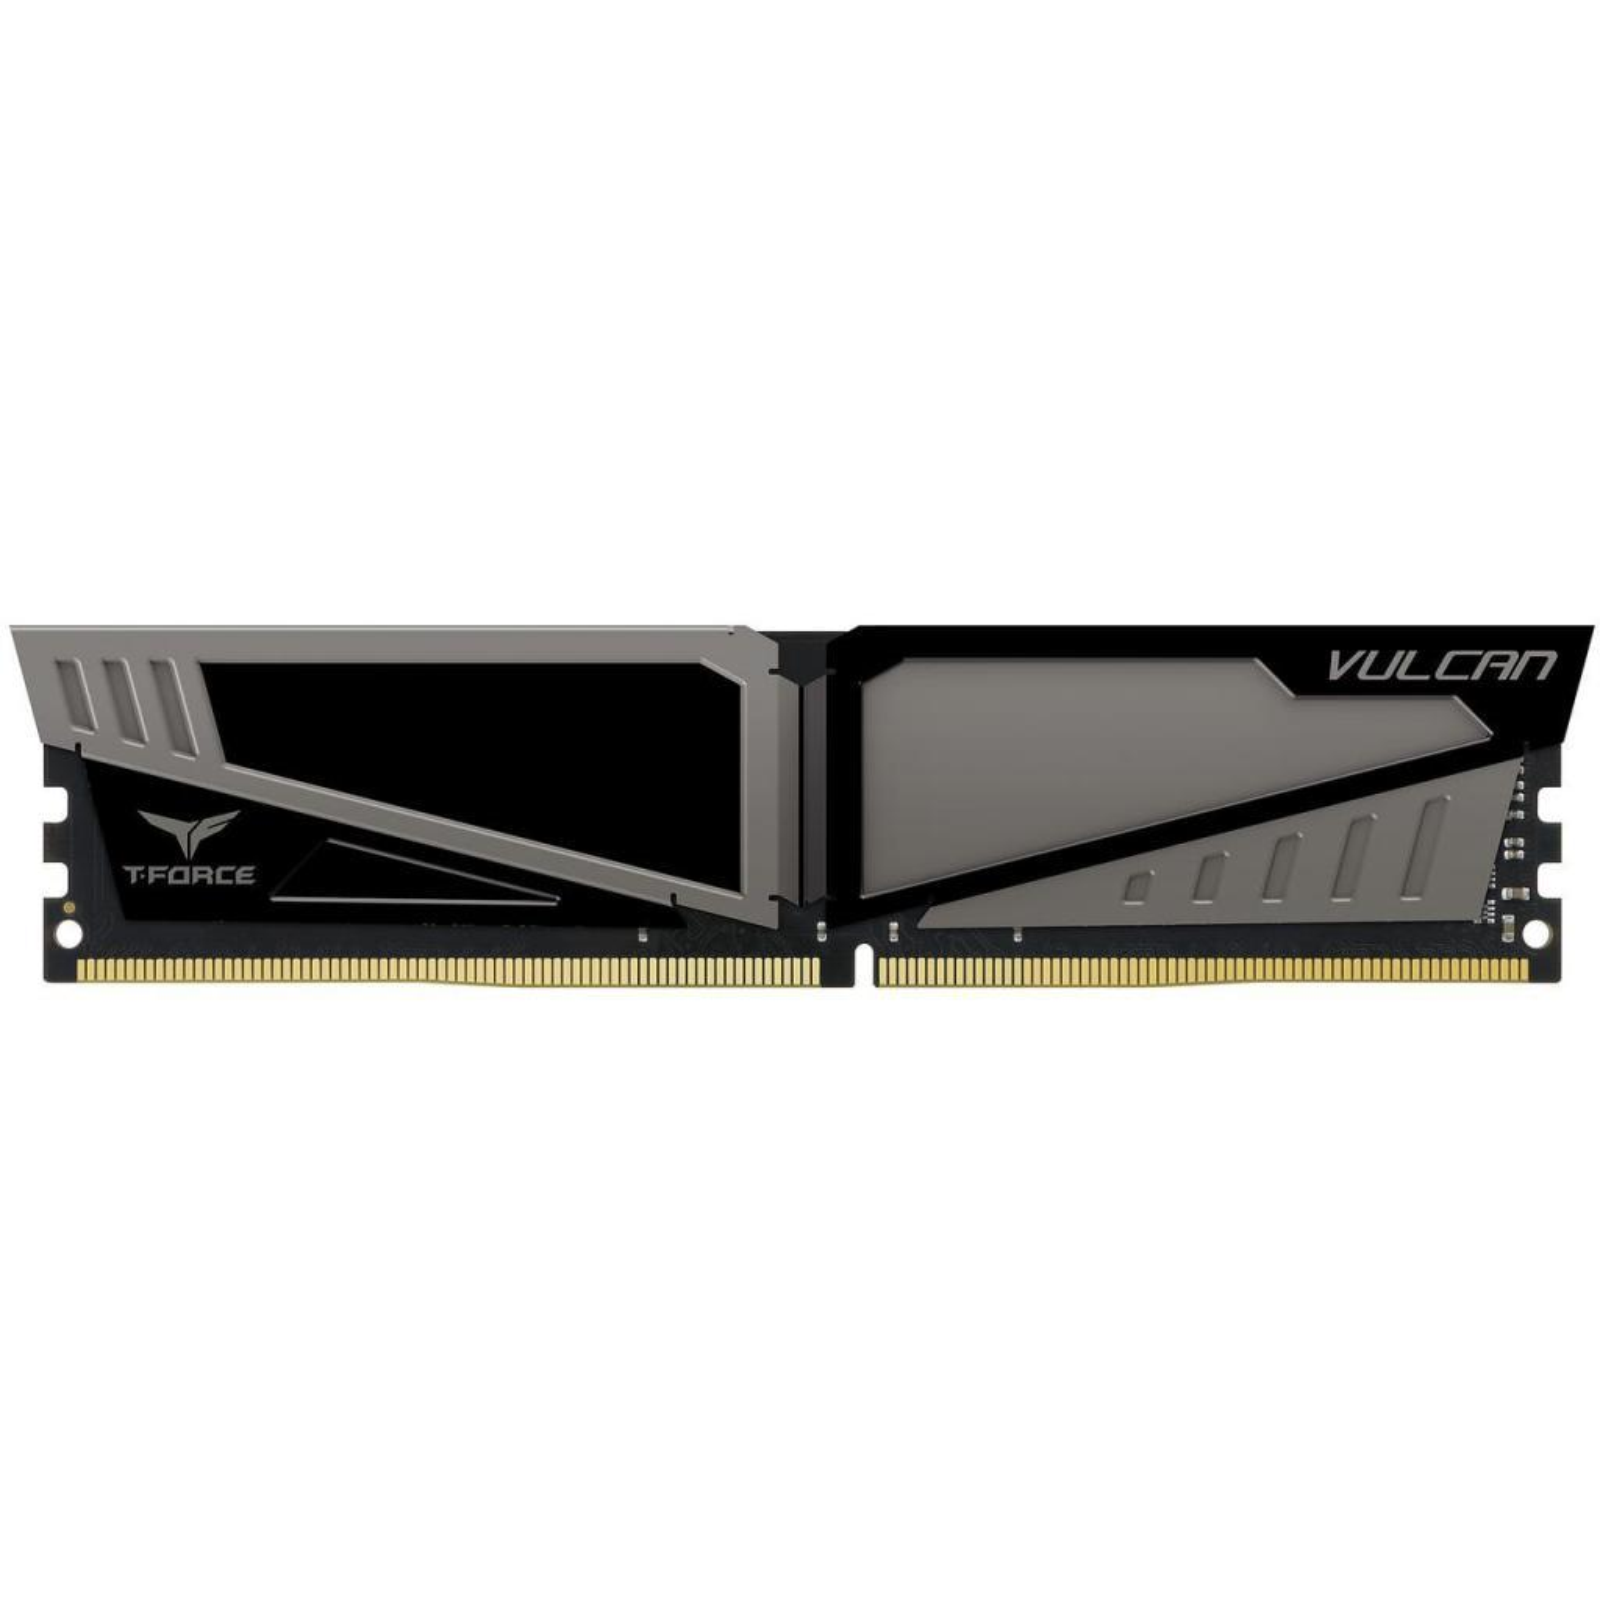 Модуль памяти для компьютера DDR4 8GB 2666 MHz T-Force Vulcan Gray Team (TLGD48G2666HC15B01)